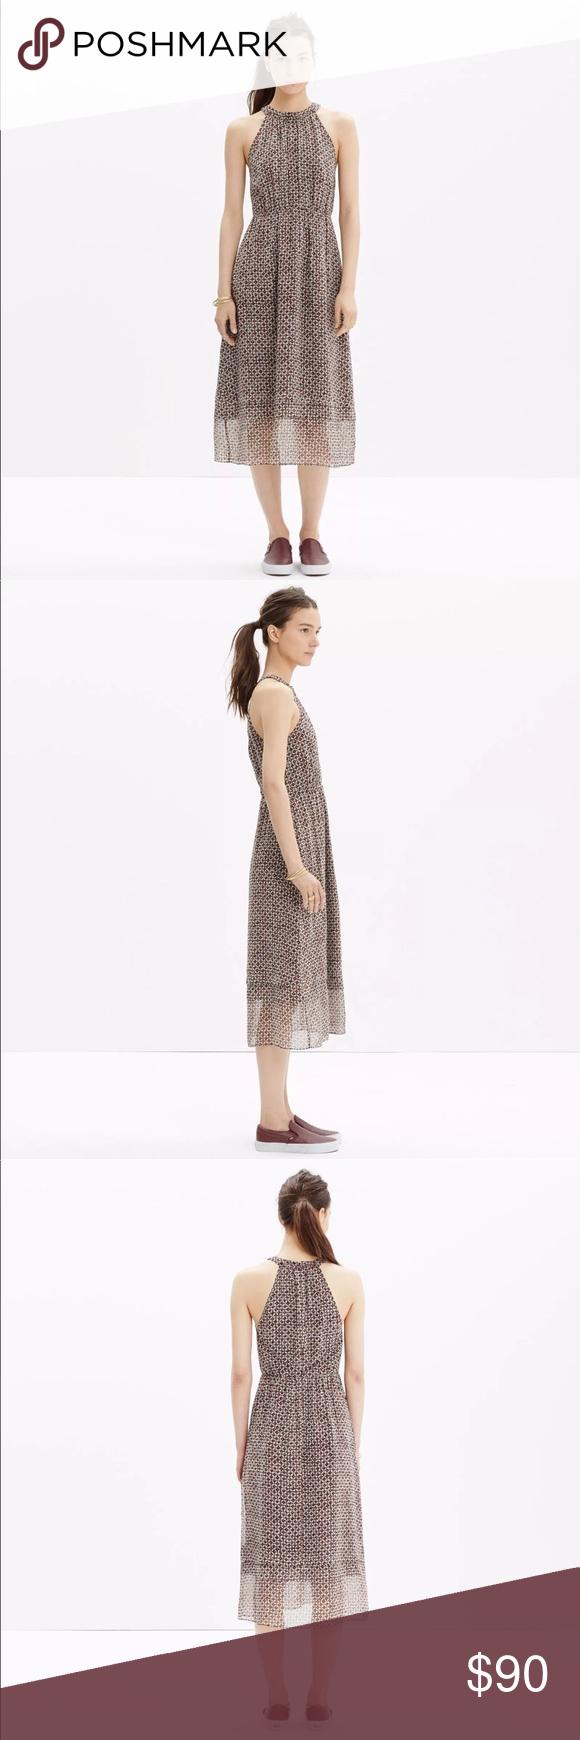 Madewell Silk Midi Dress In Diamond Tile Brown Madewell Silk Dress Madewell Dresses Silk Midi Dress [ 1740 x 580 Pixel ]